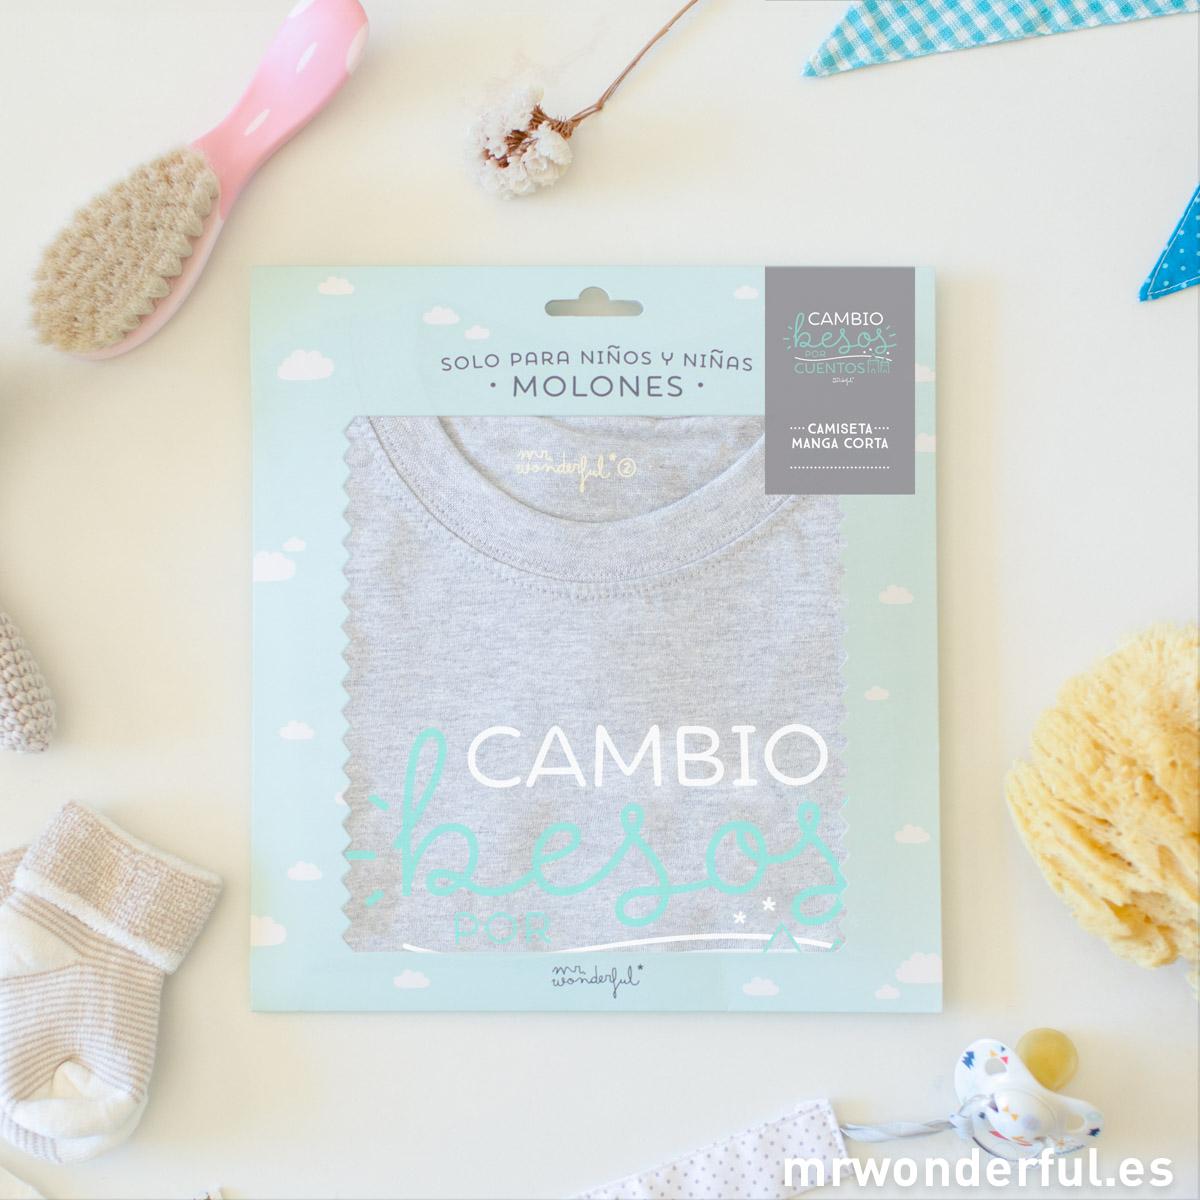 mrwonderful_8436547191093_CAMIS_010_Camiseta-nino-Cambio-besos-por-cuentos-14-Editar-3